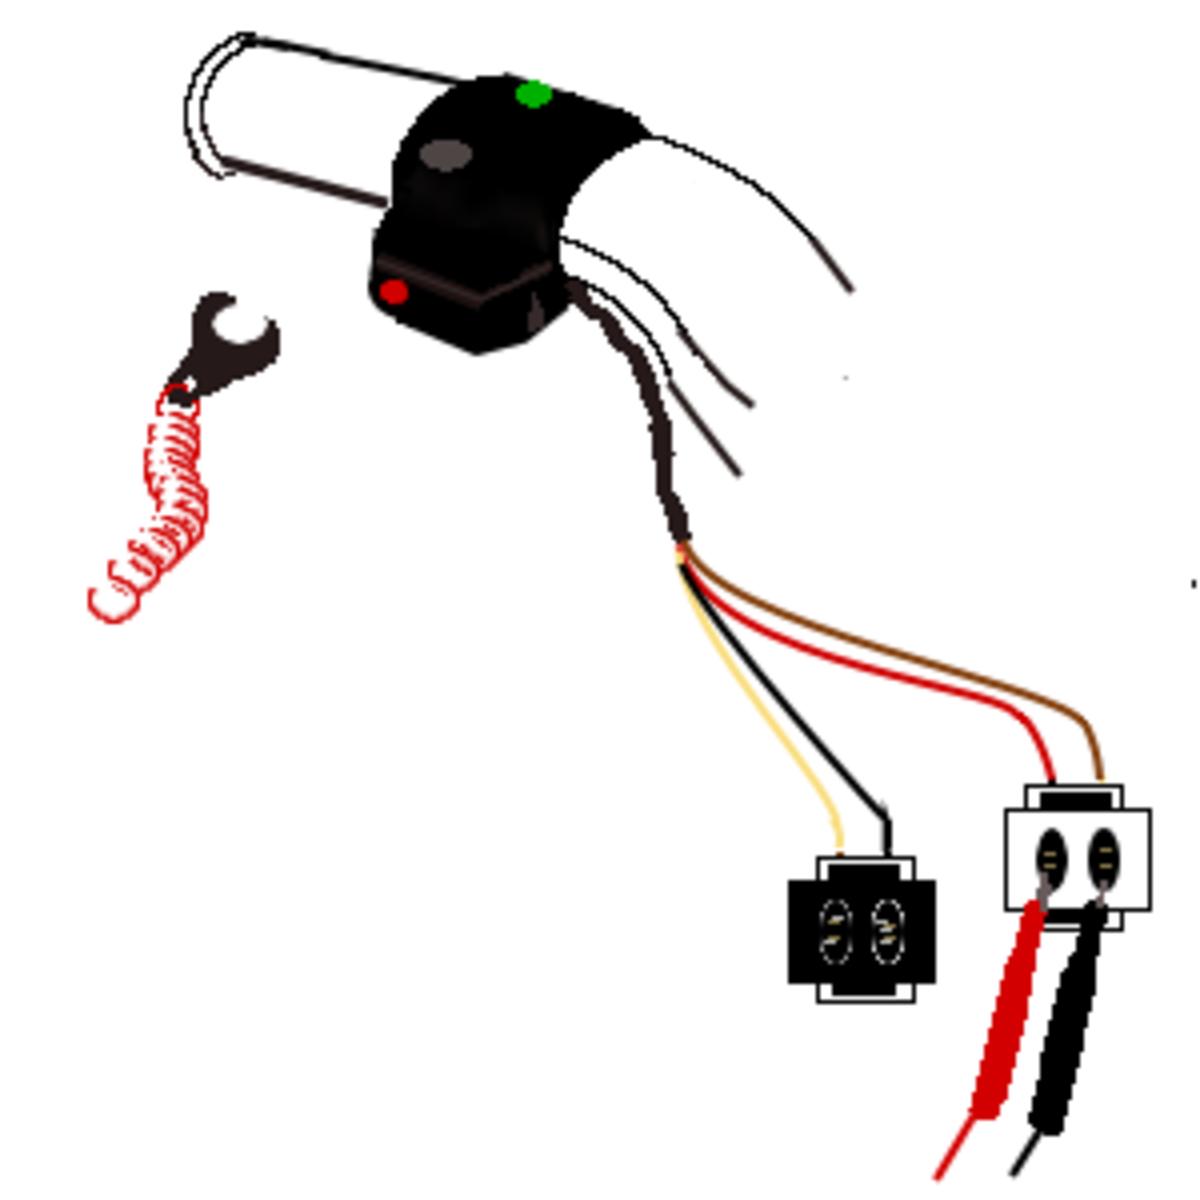 5. Probe the start switch.